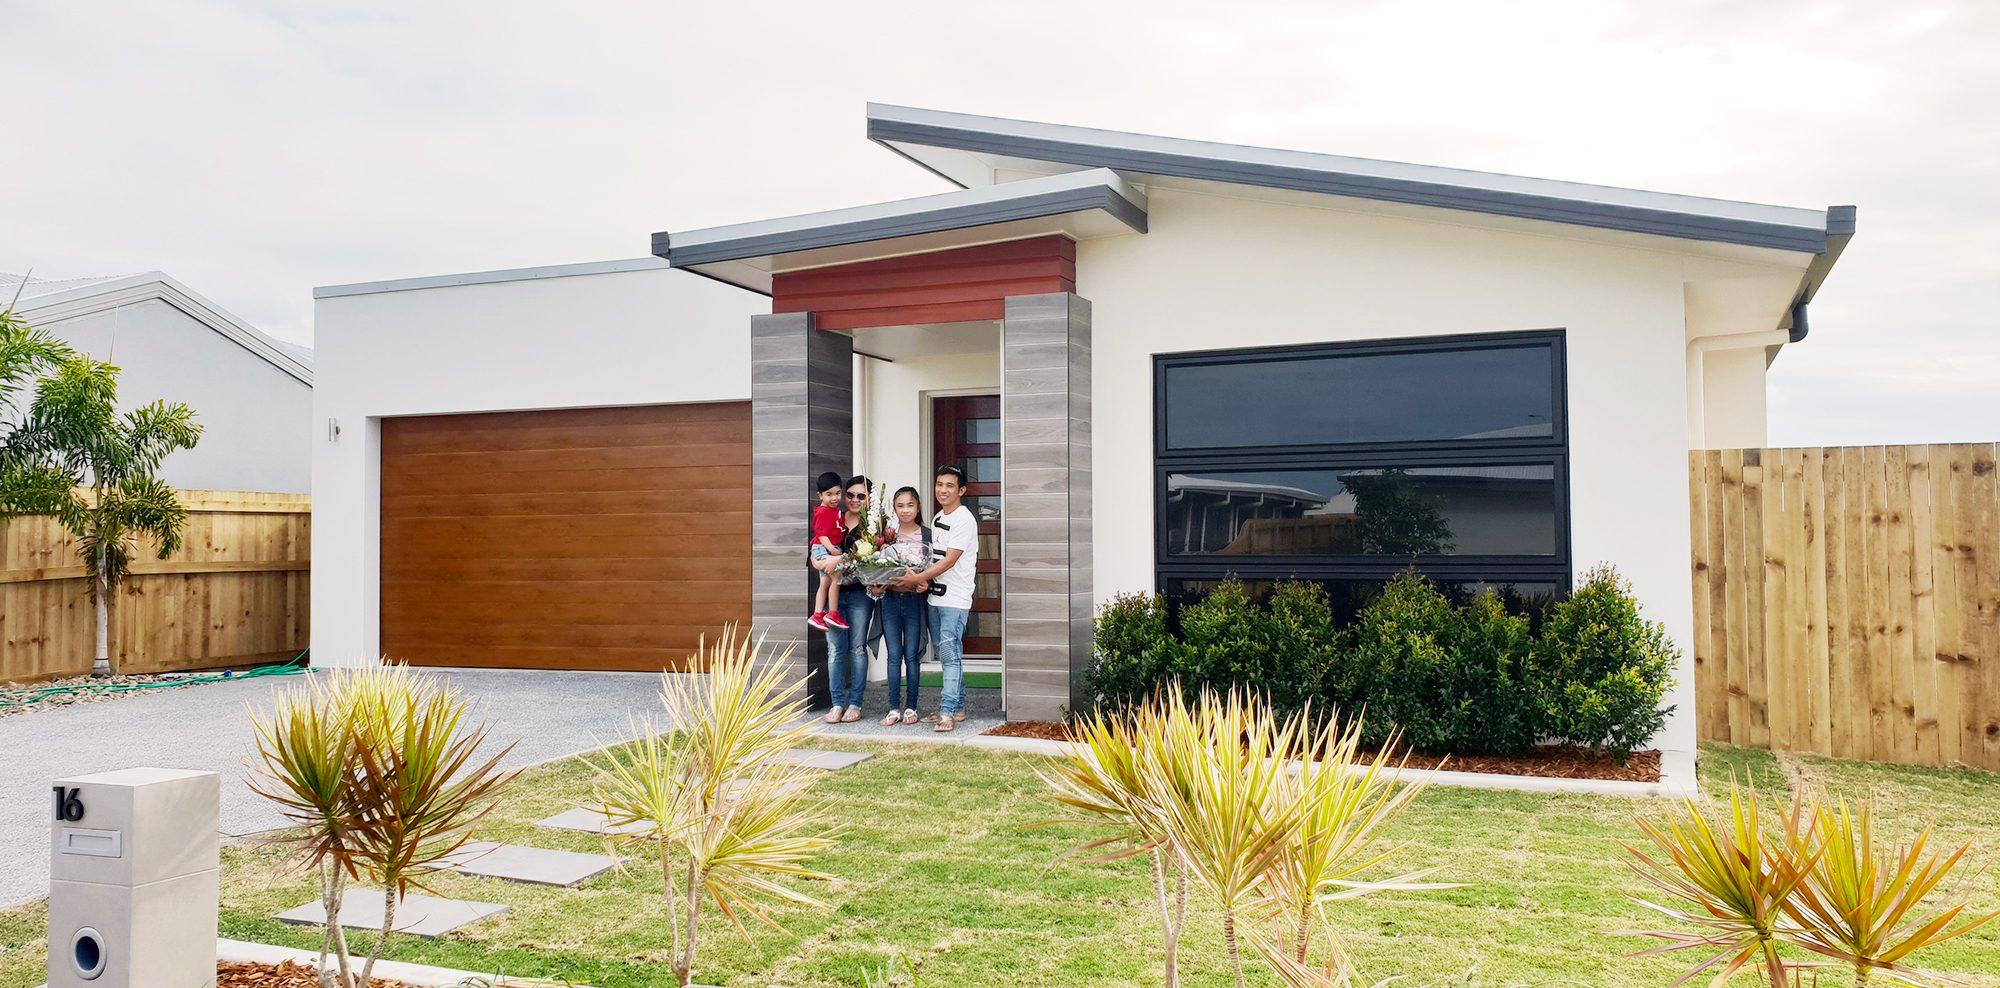 Ramiro and Jeraldine New home handover